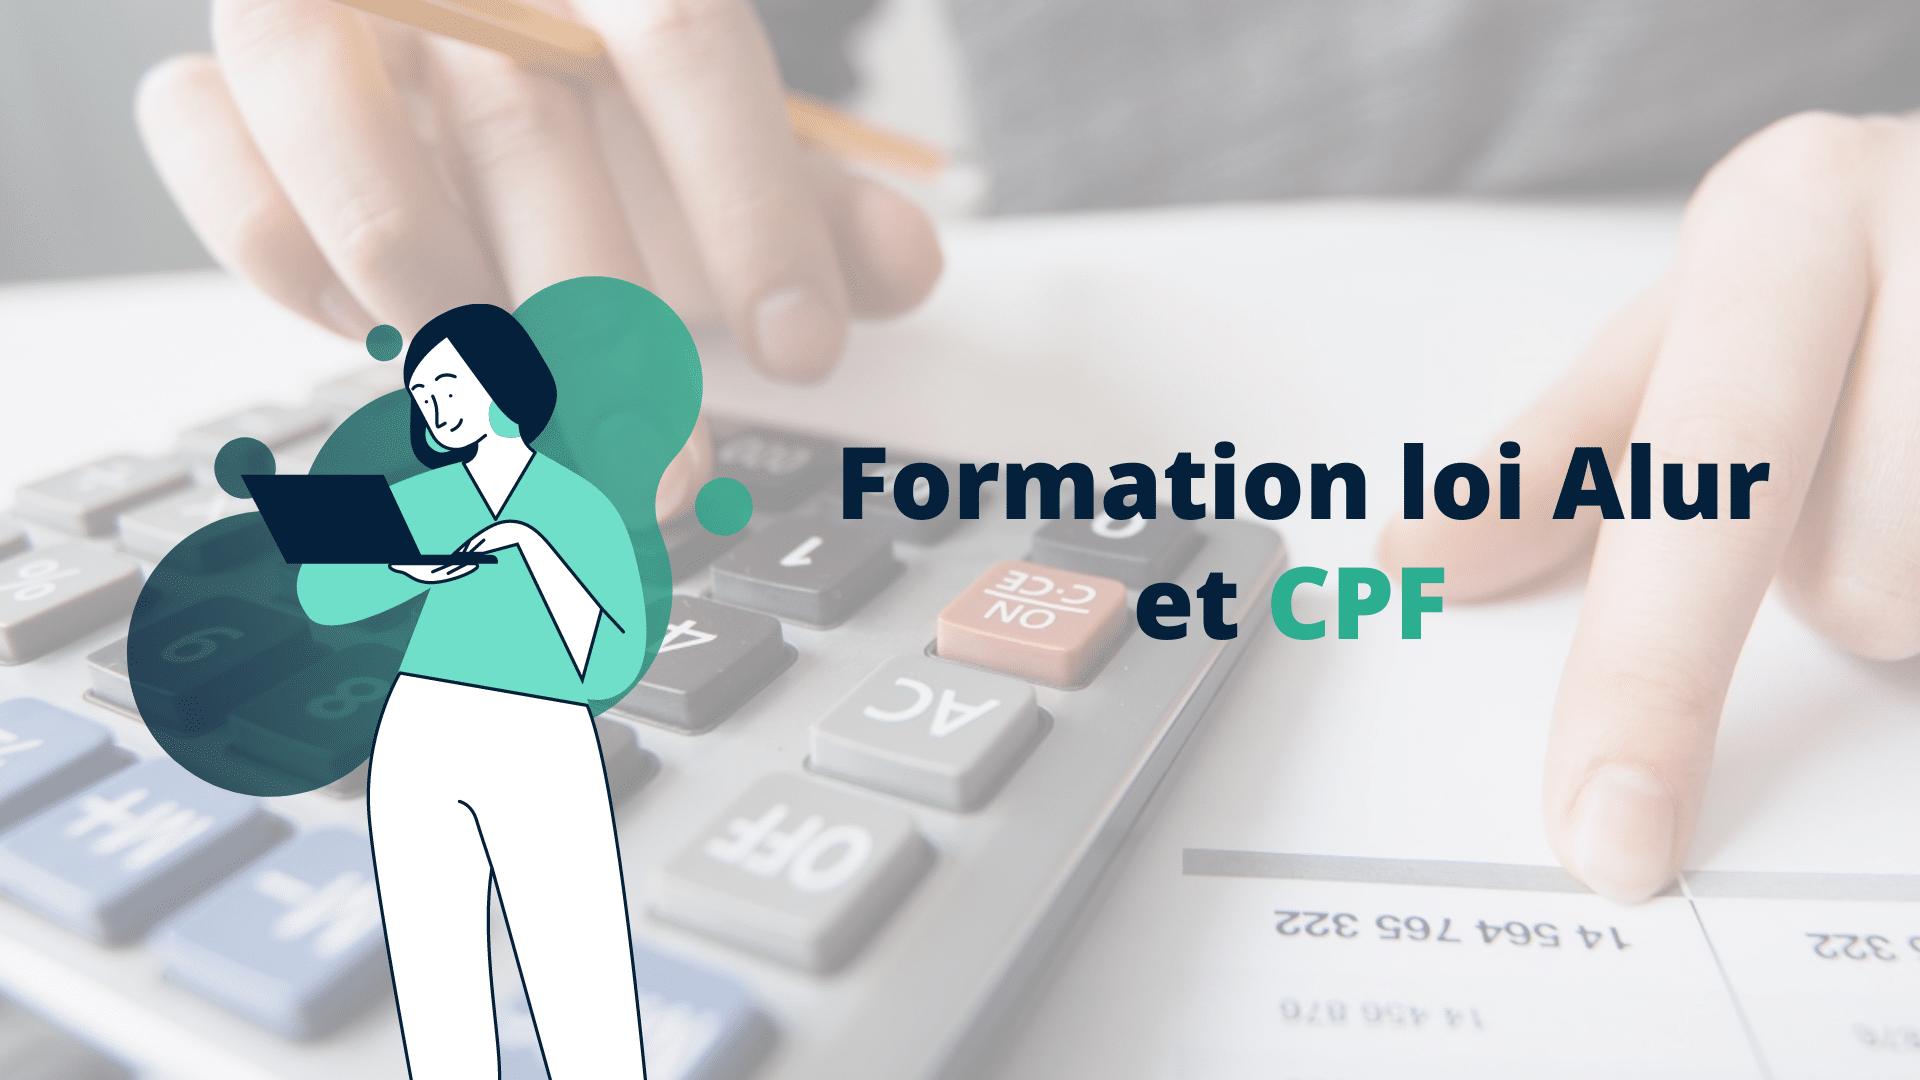 Formation loi Alur et CPF